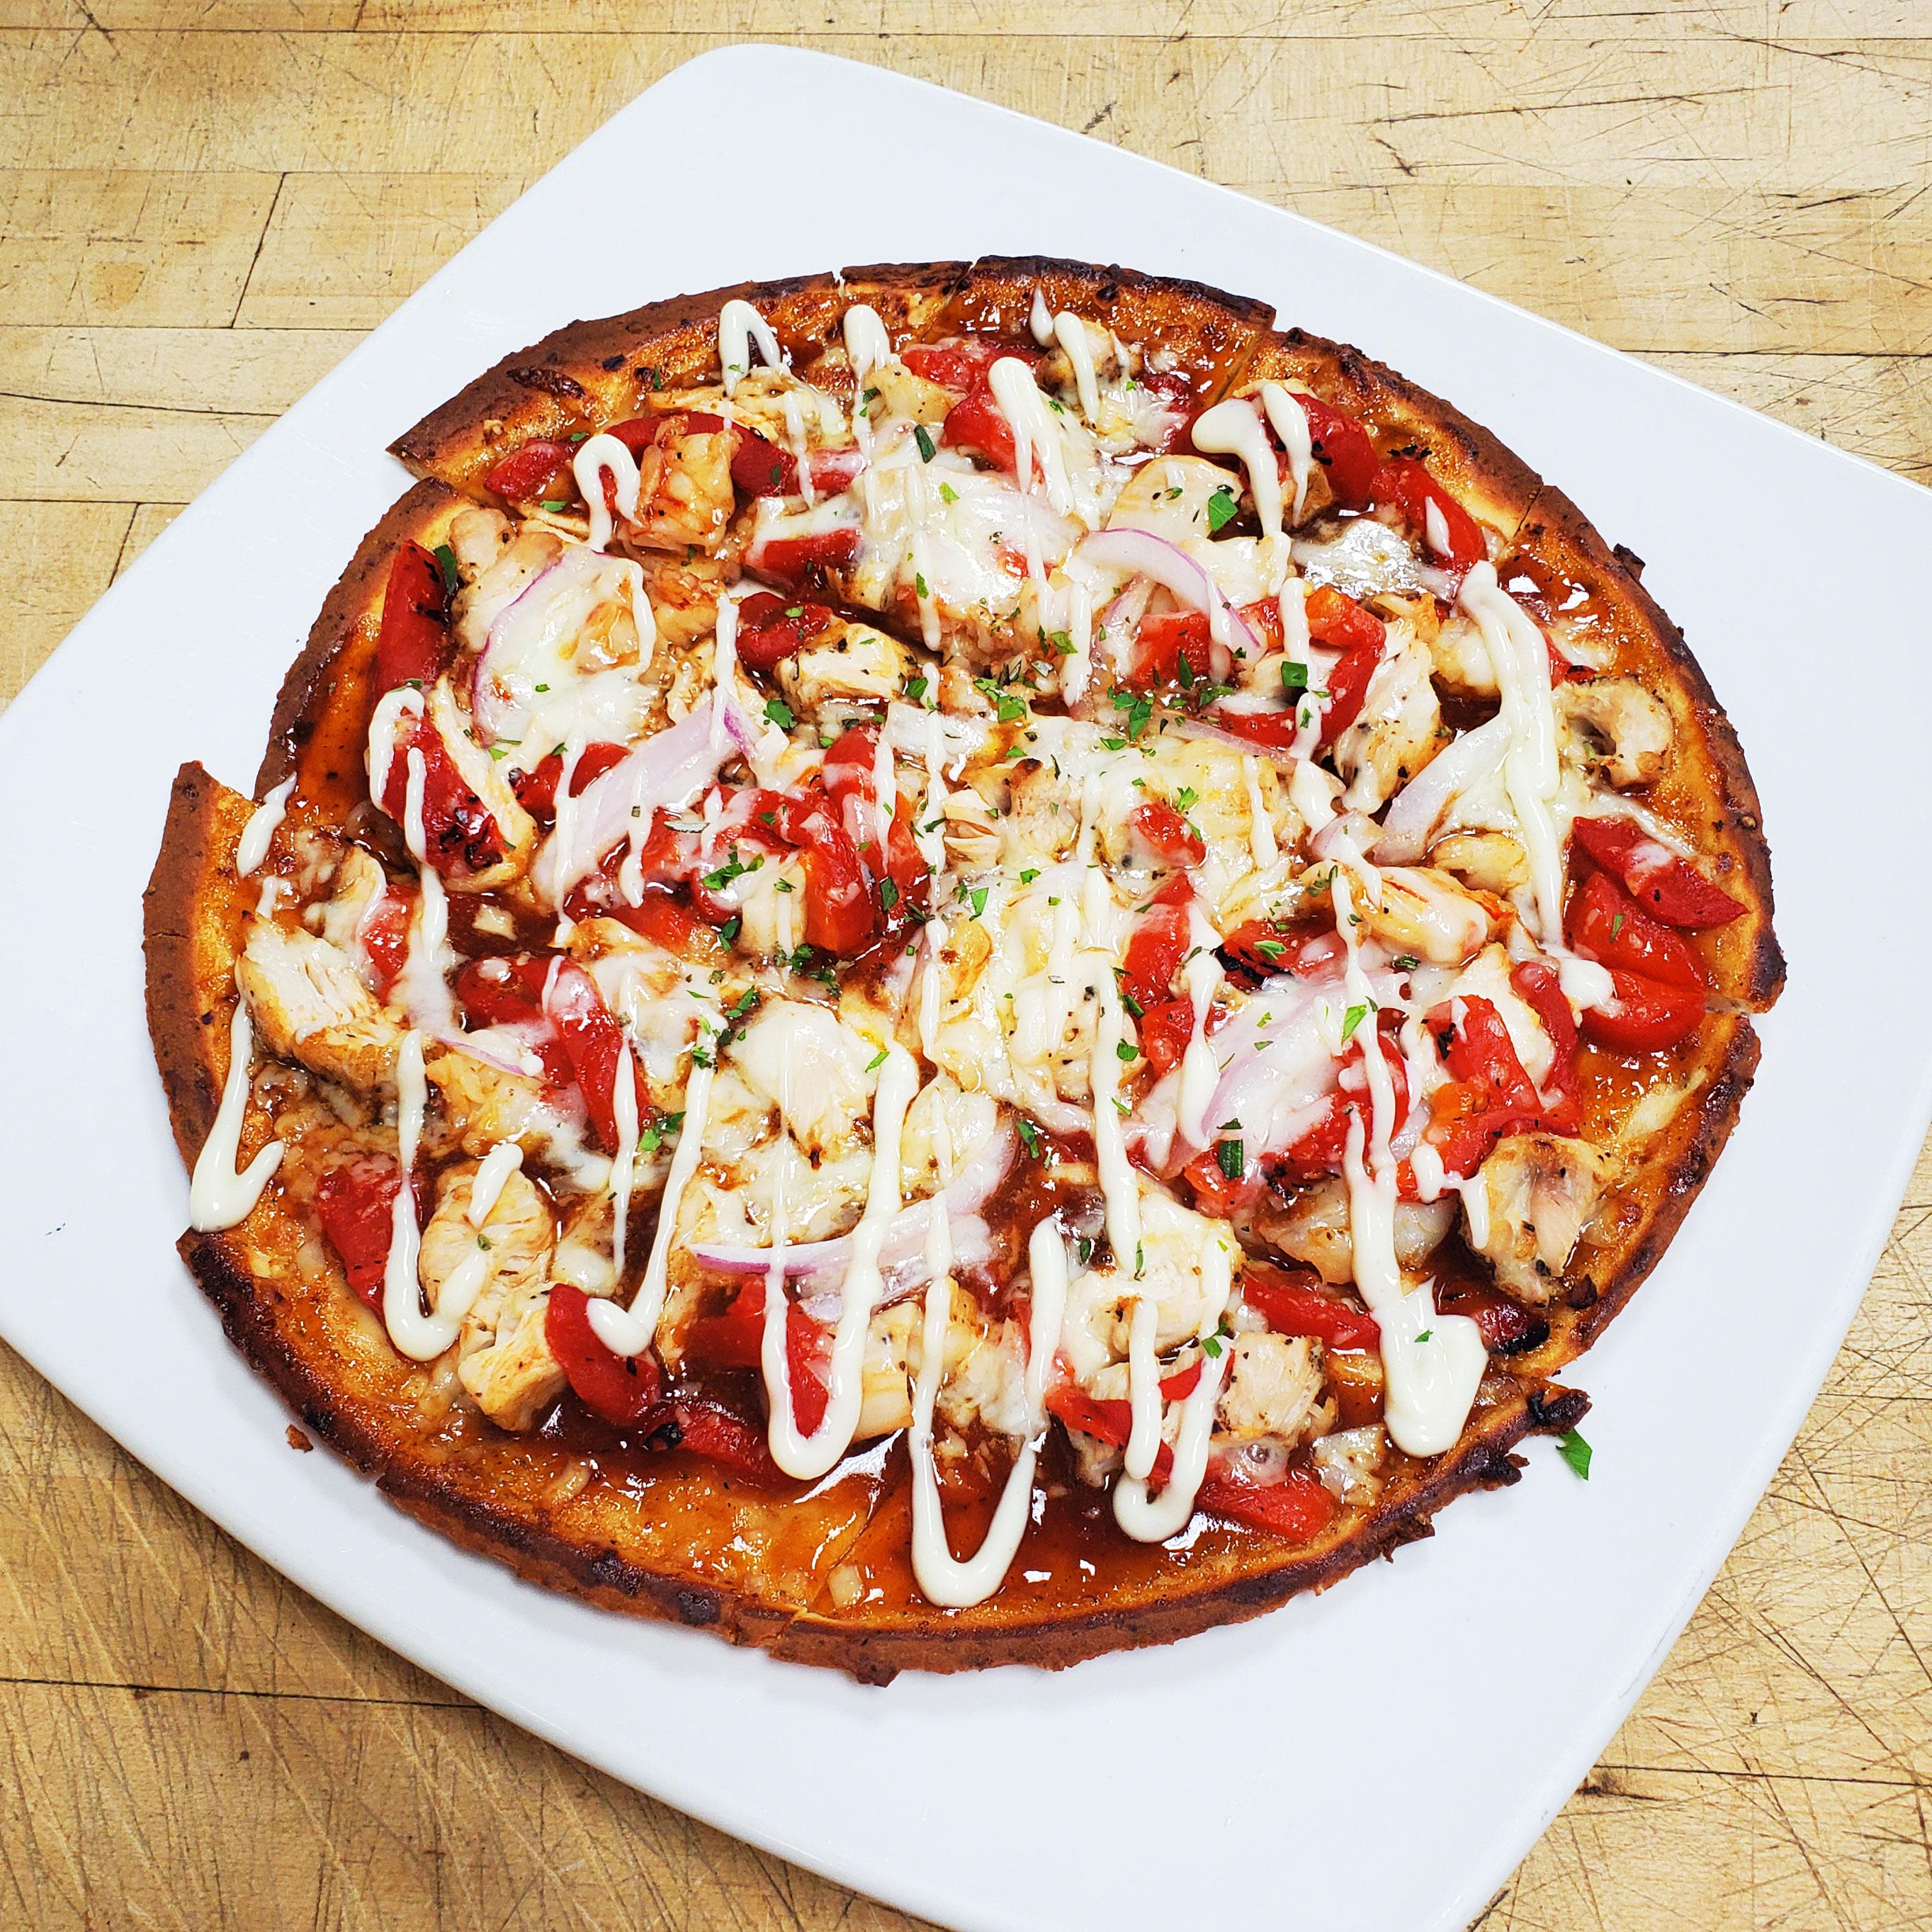 Shrimp & Chicken Flatbread